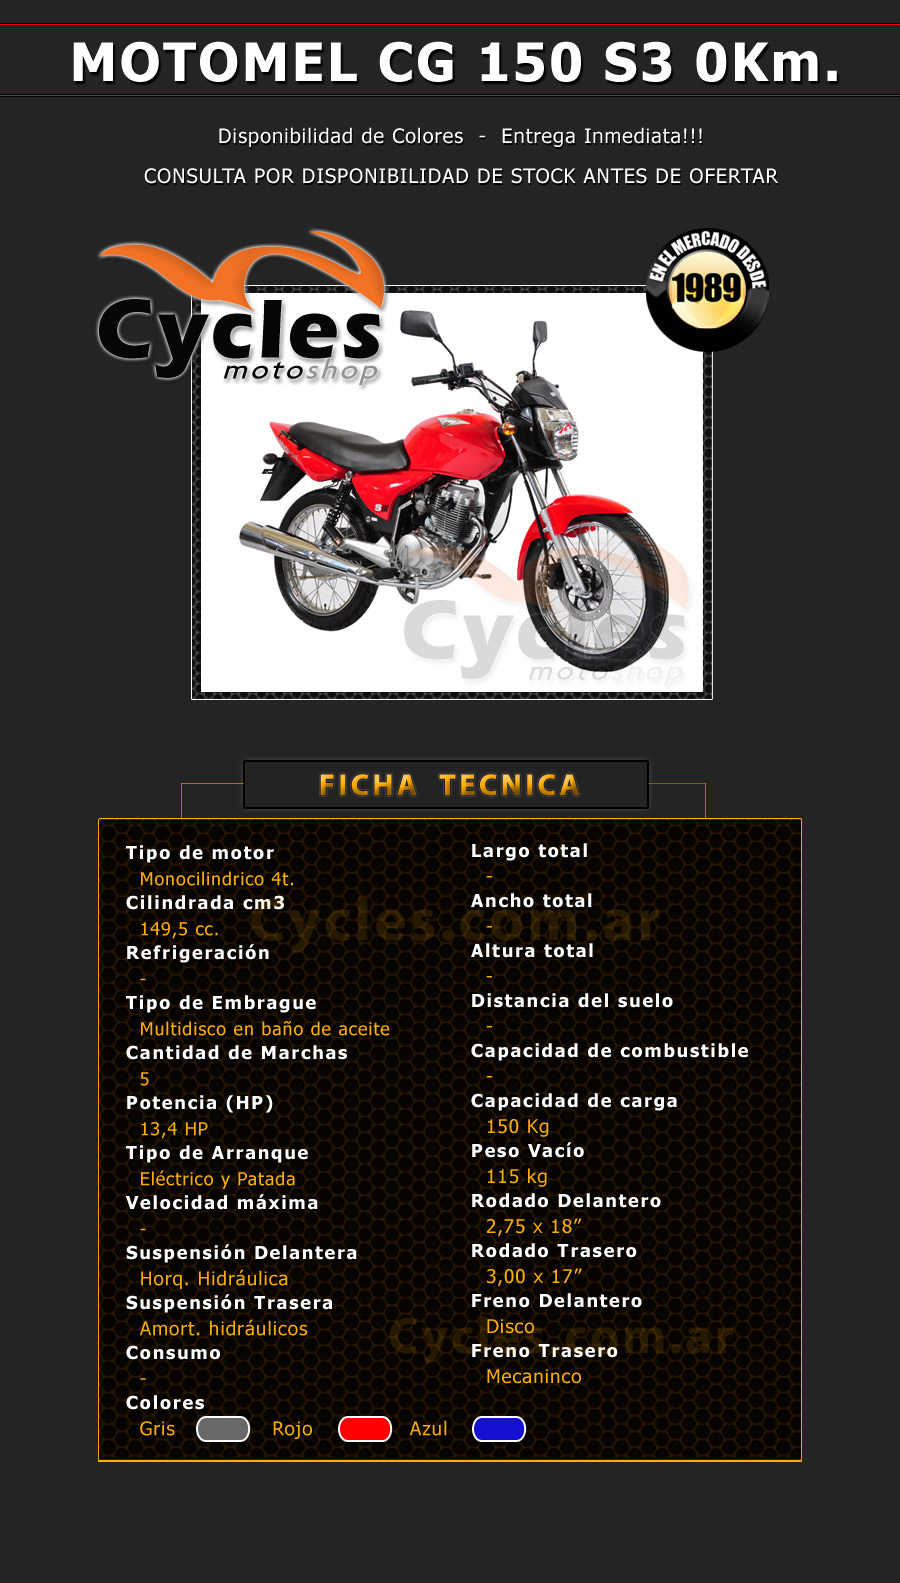 MOTOMEL CG 150 S3